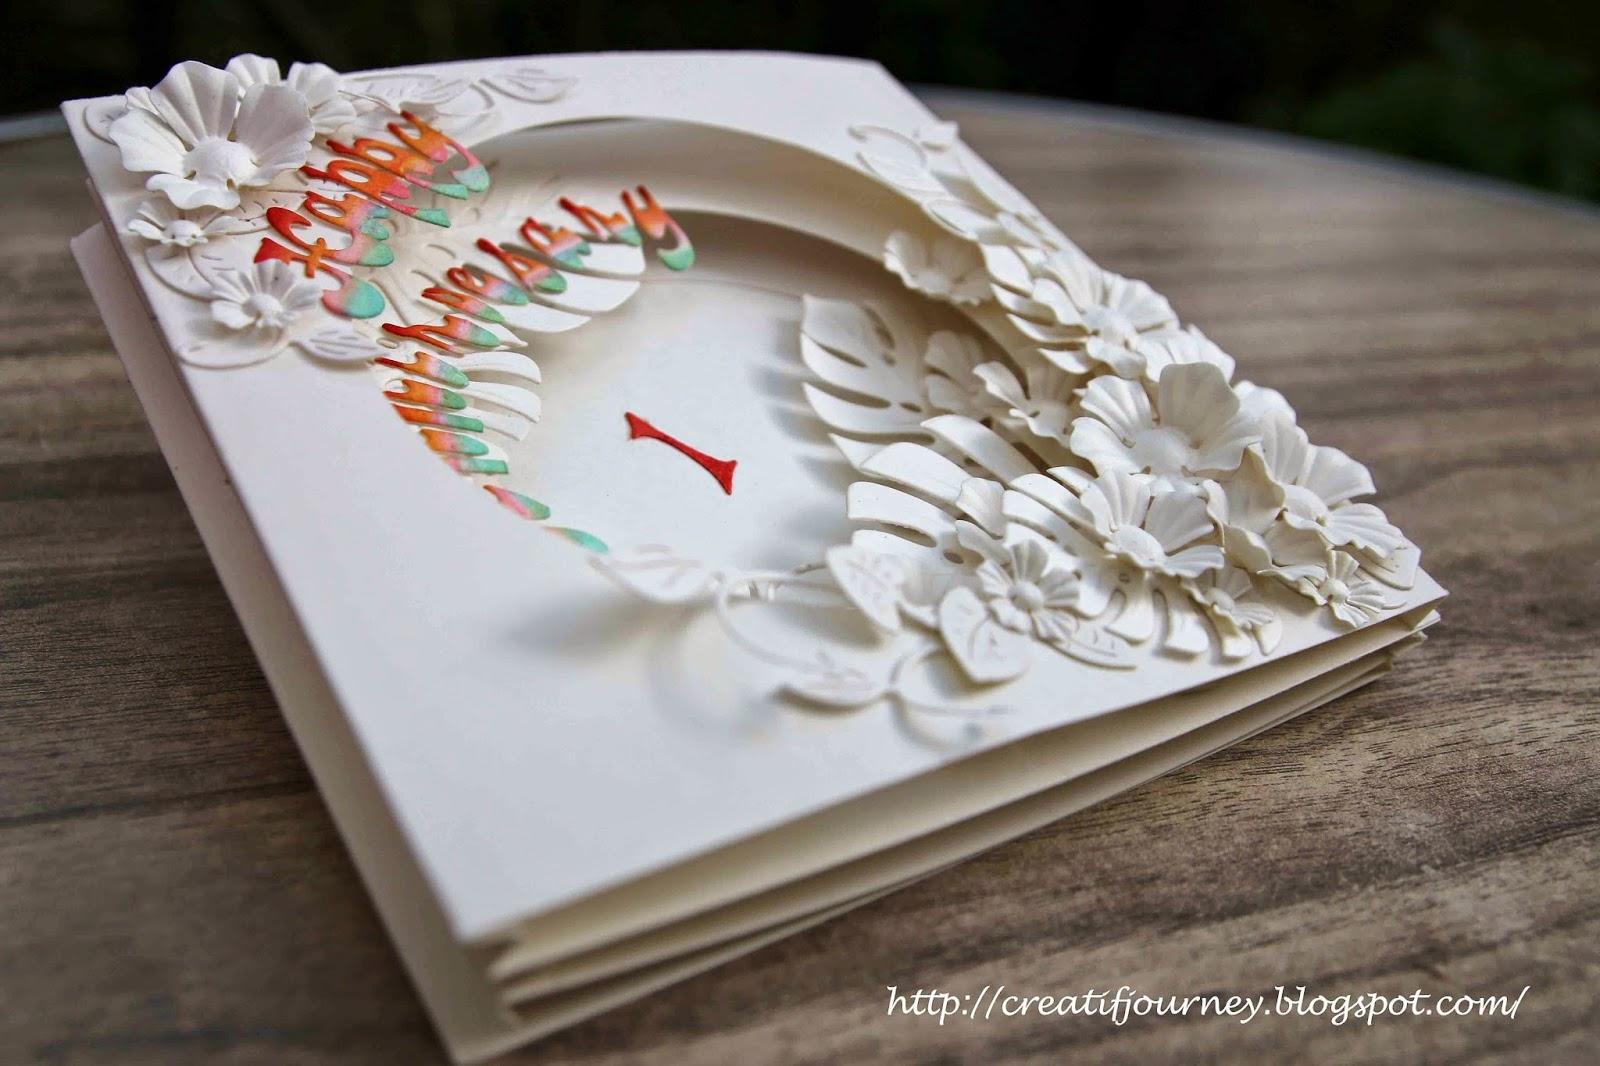 Creatif journey wedding anniversary card